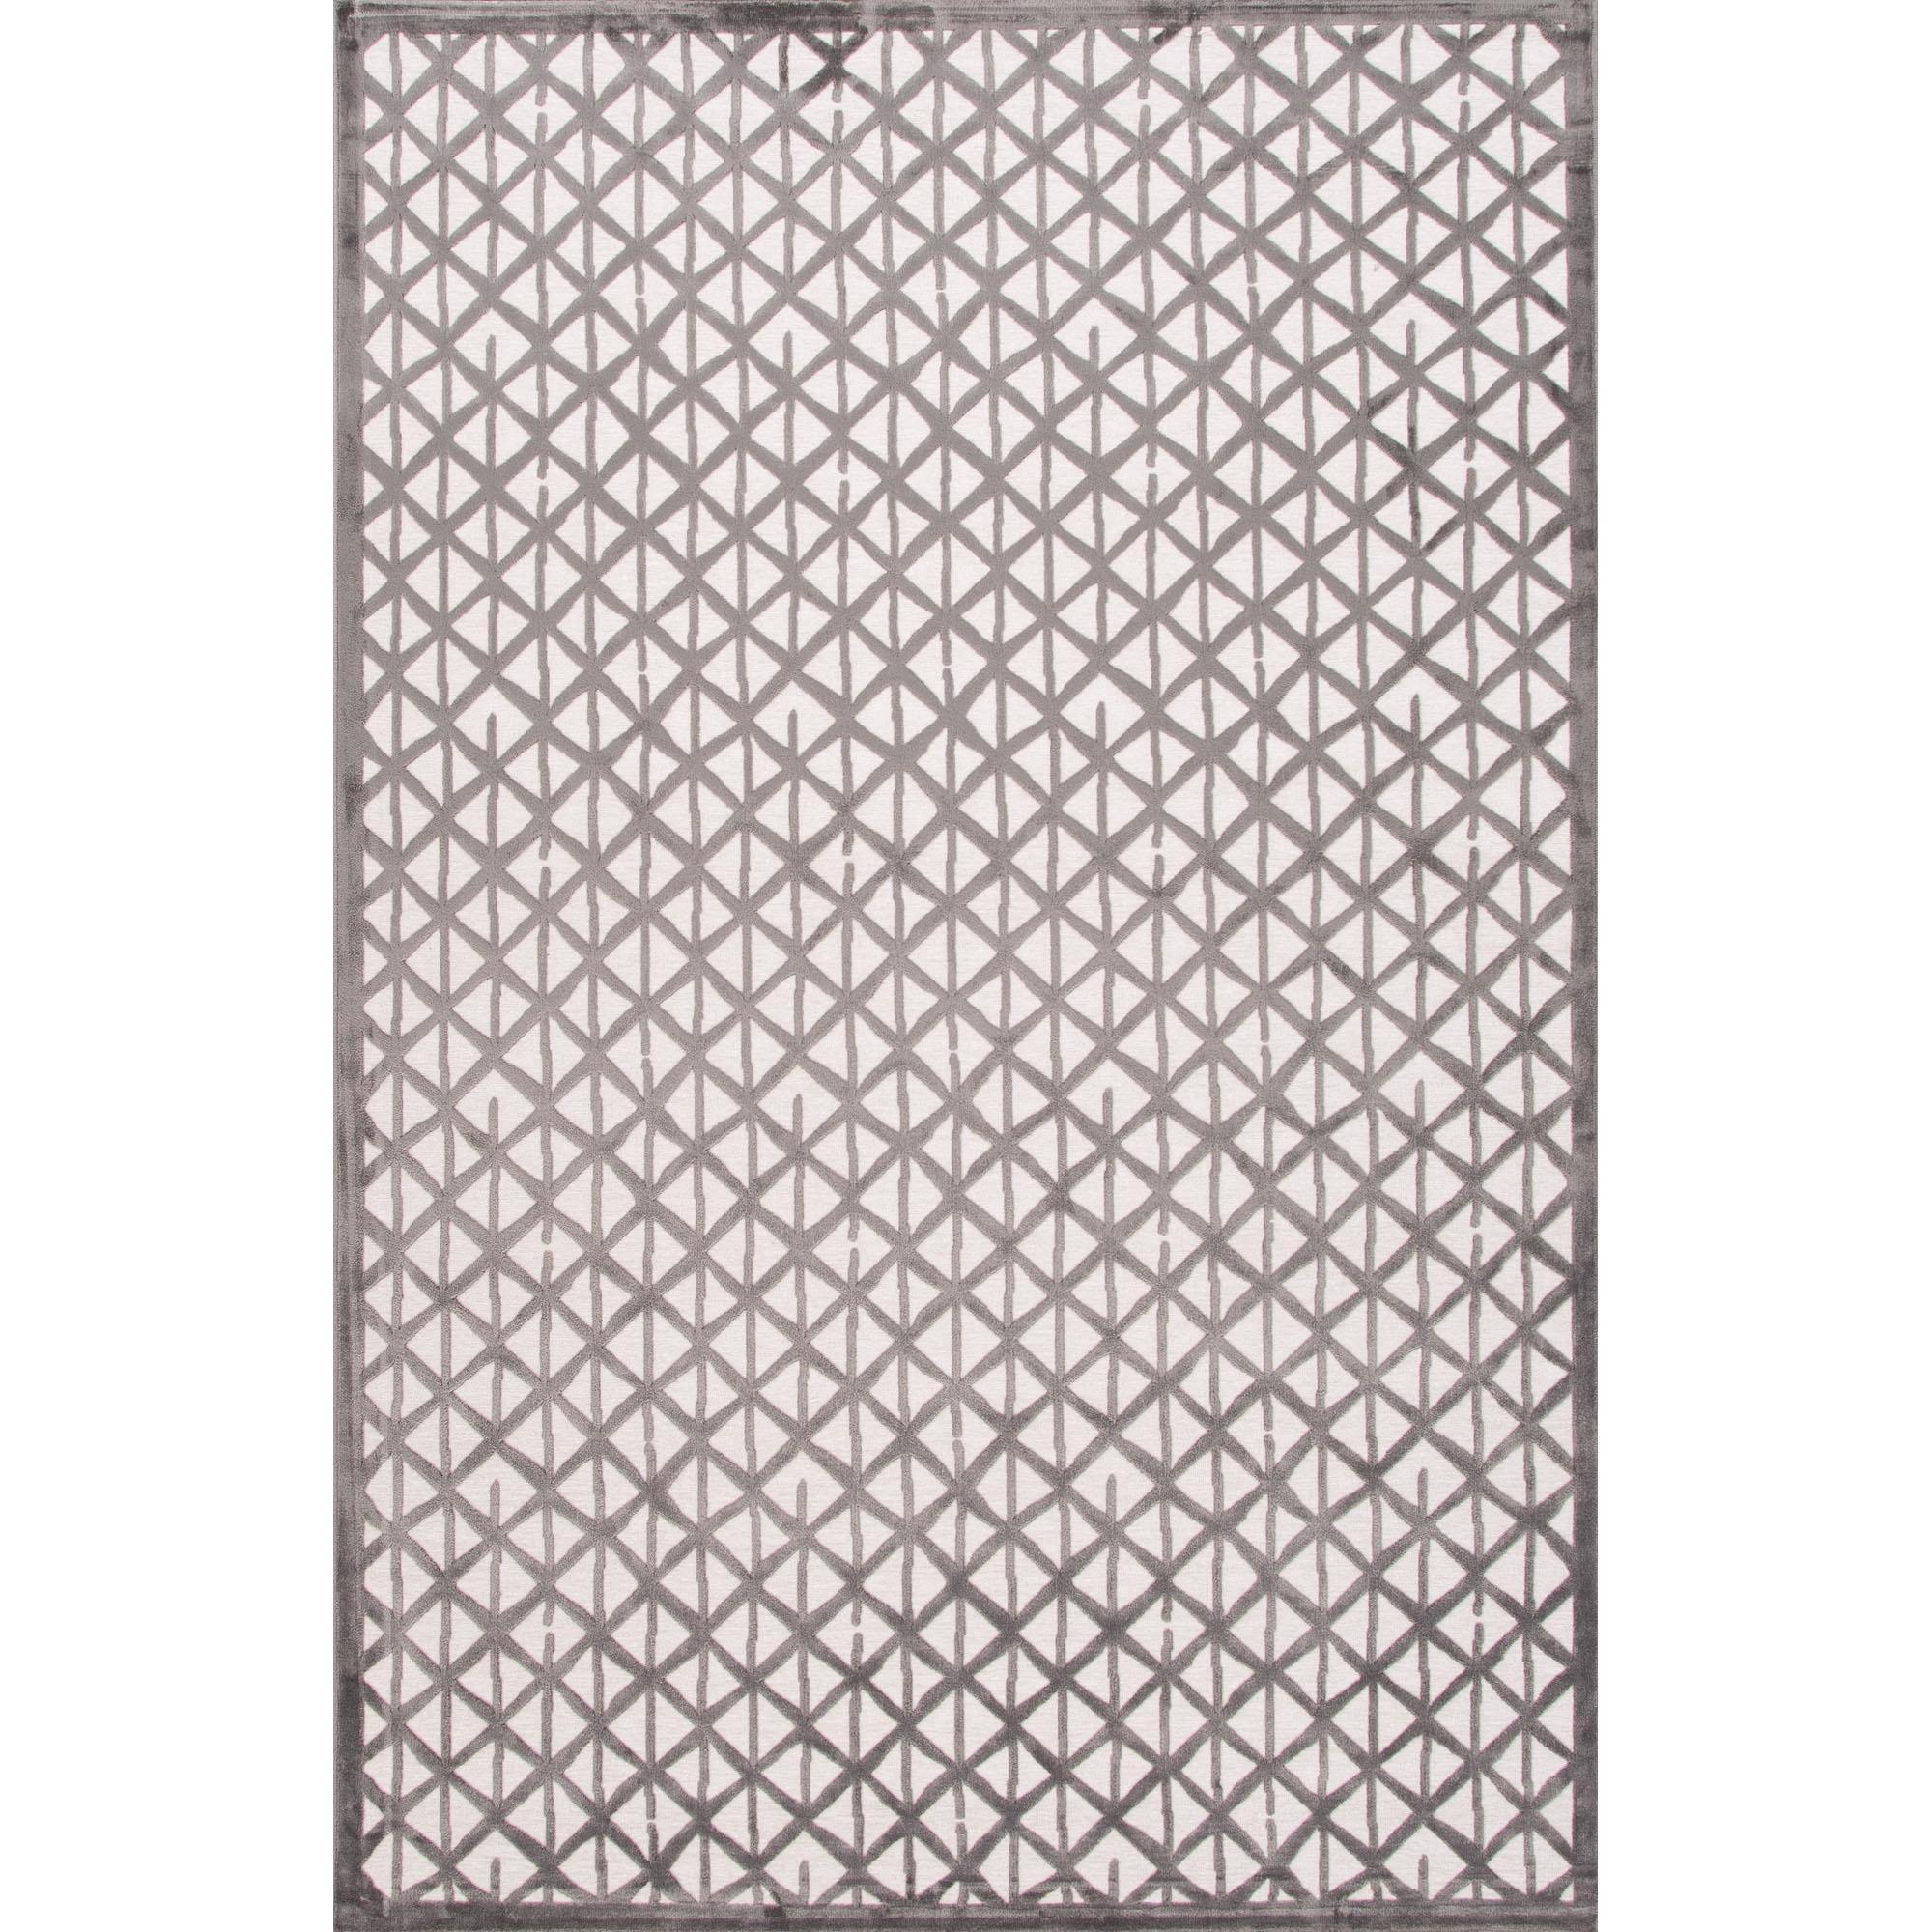 JAIPUR Rugs Fables 7.6 x 9.6 Rug - Item Number: RUG111955